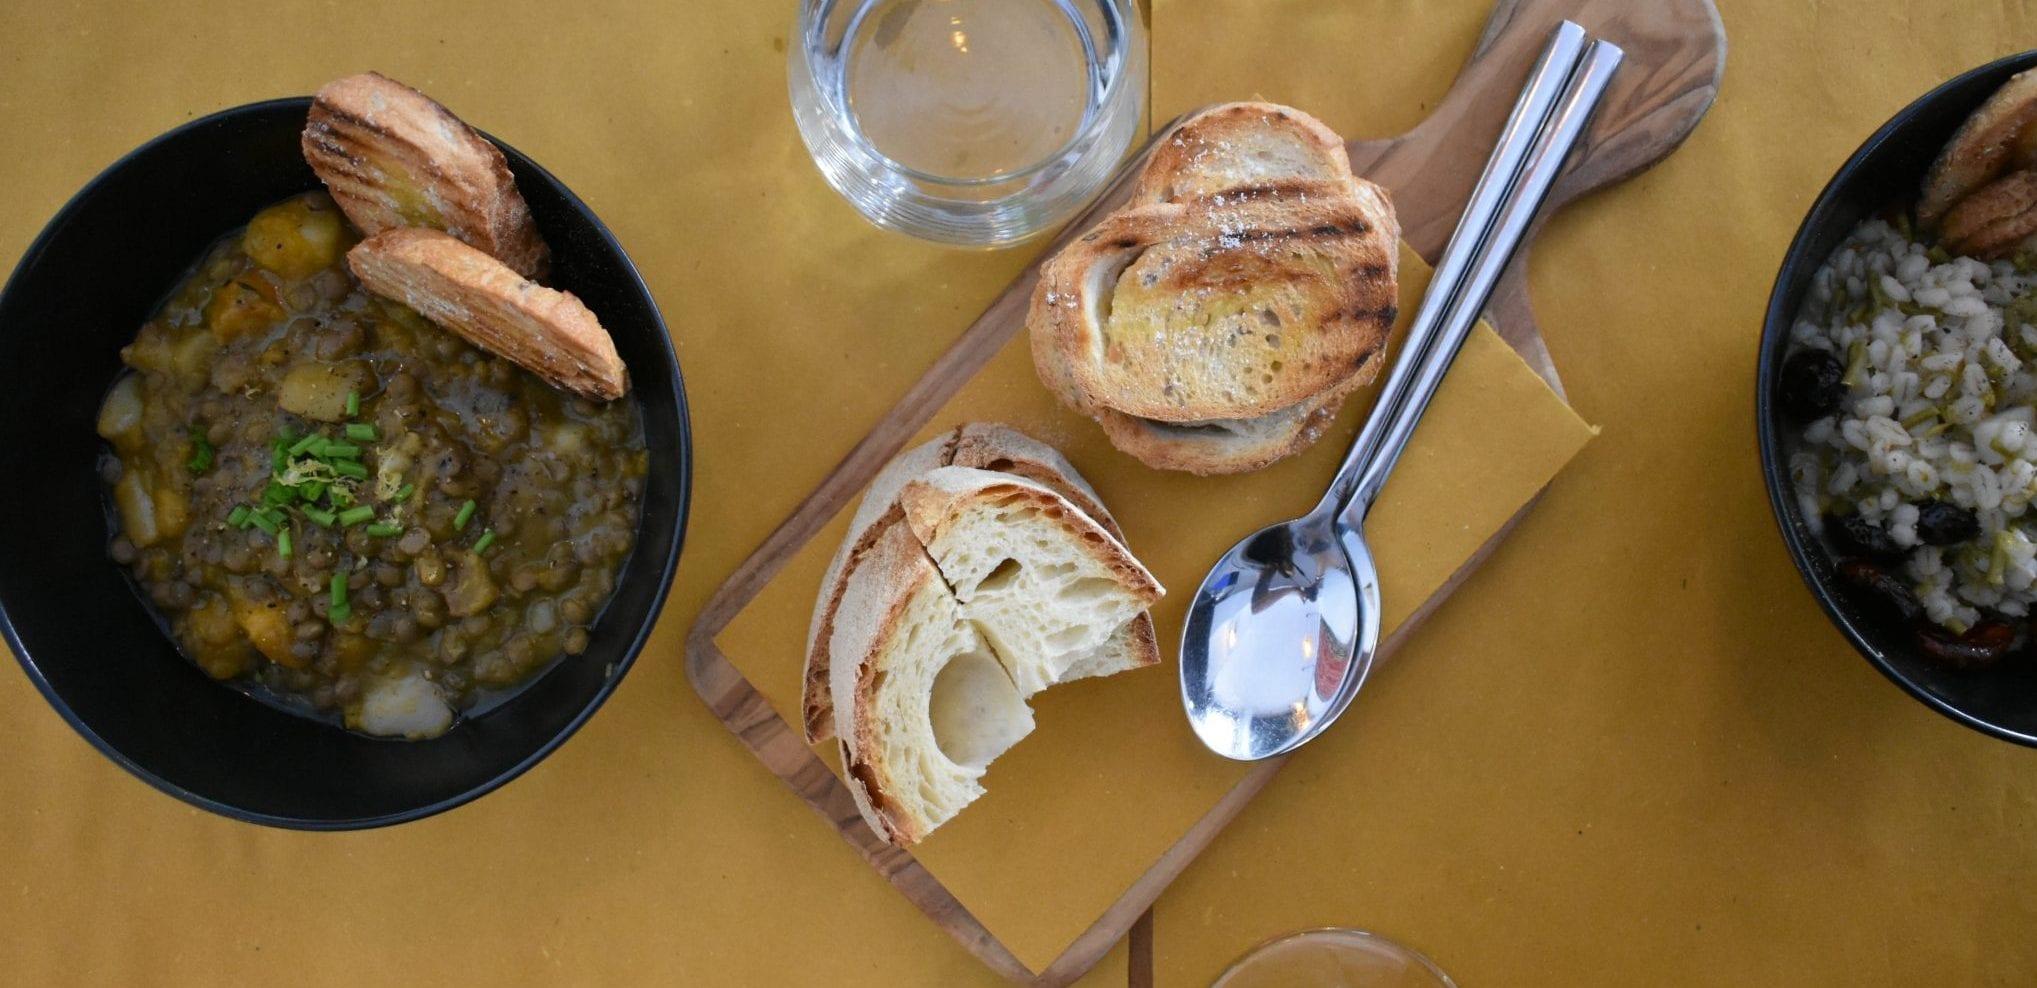 zuppe -PestaPepe - Leplume